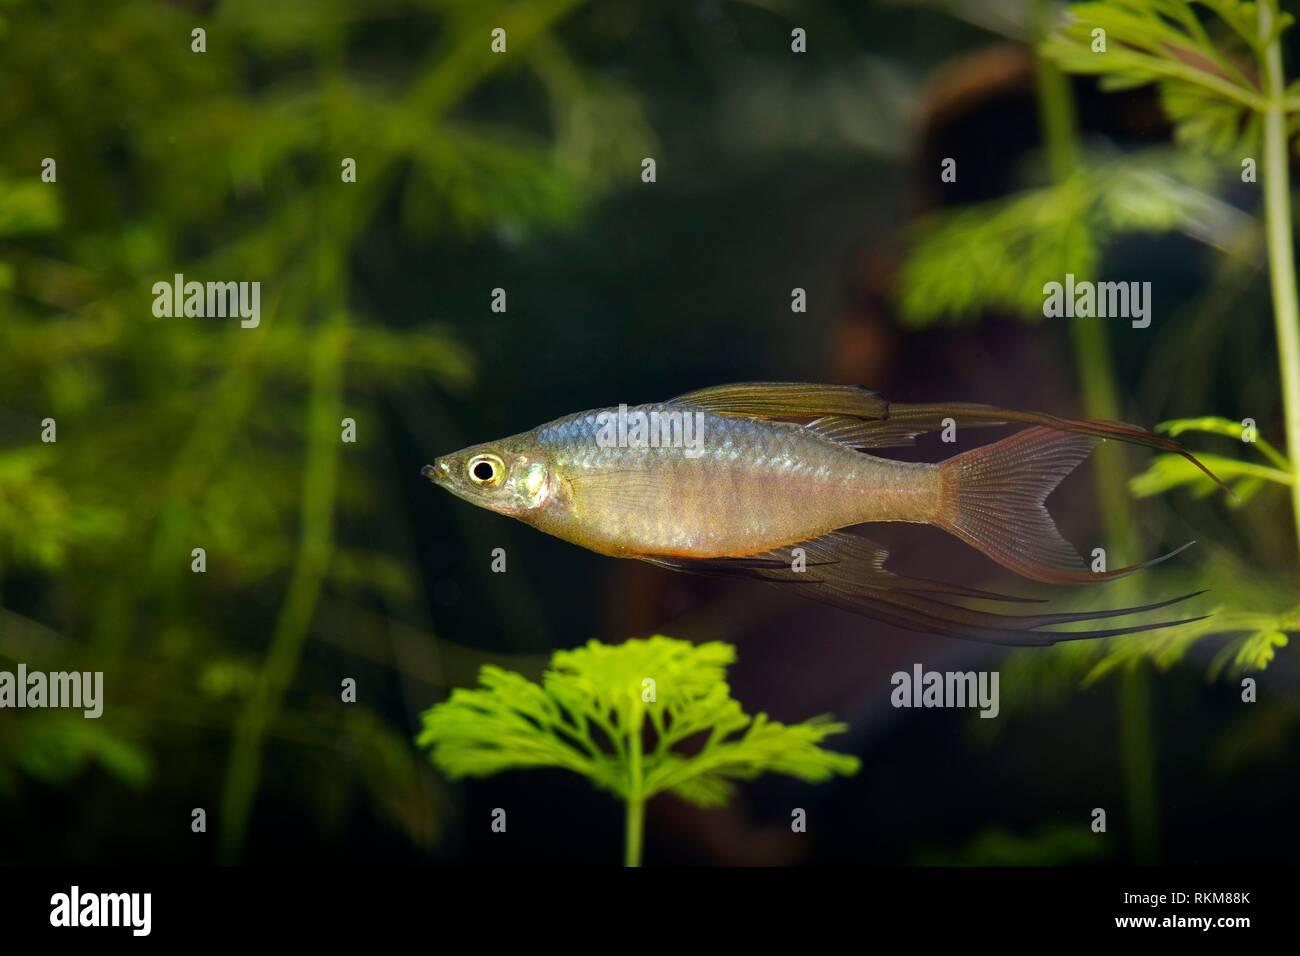 Threadfin Rainbowfish Iriatherina Werneri Stock Photo Alamy